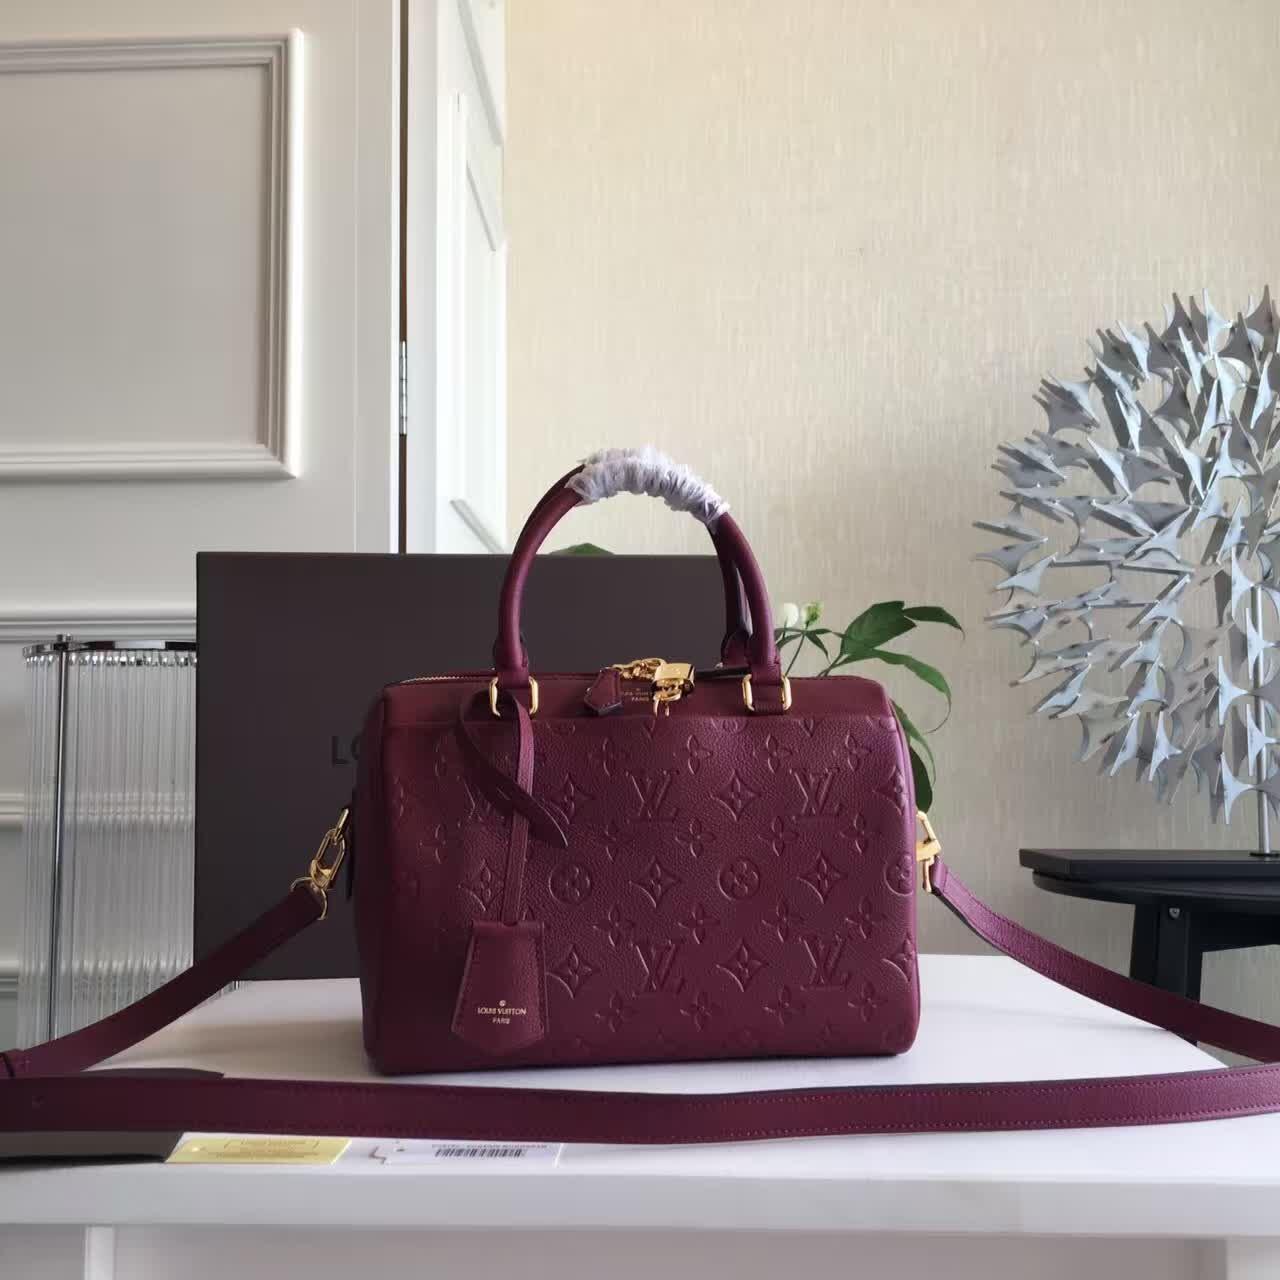 Женская сумка Louis Vuitton Speedy 25